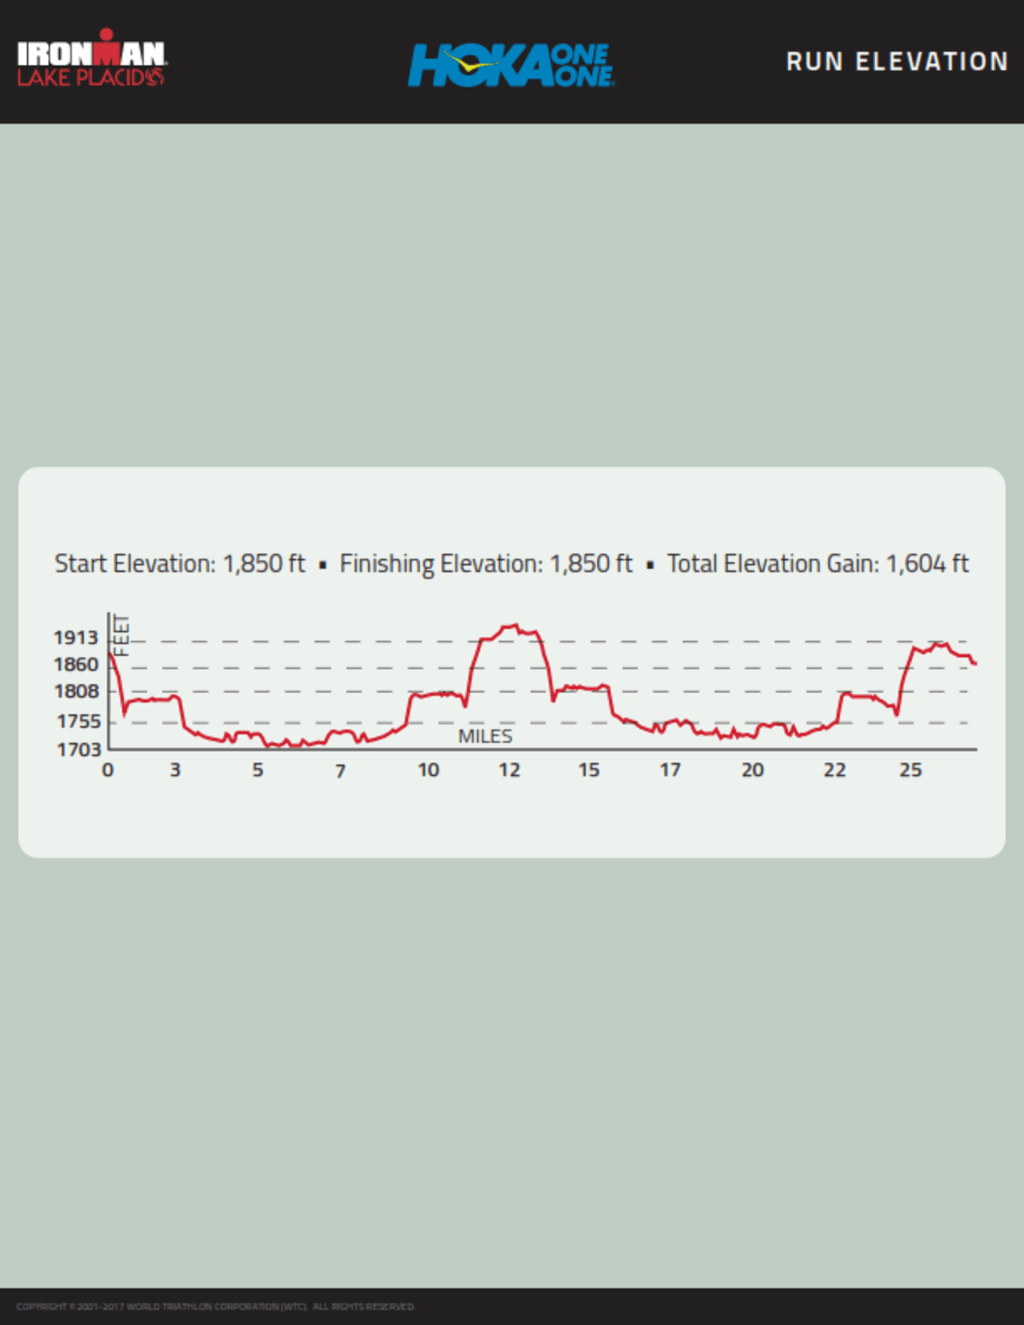 ironman-course-map-im-lake-placid-run-elevation-2017-web_001.png